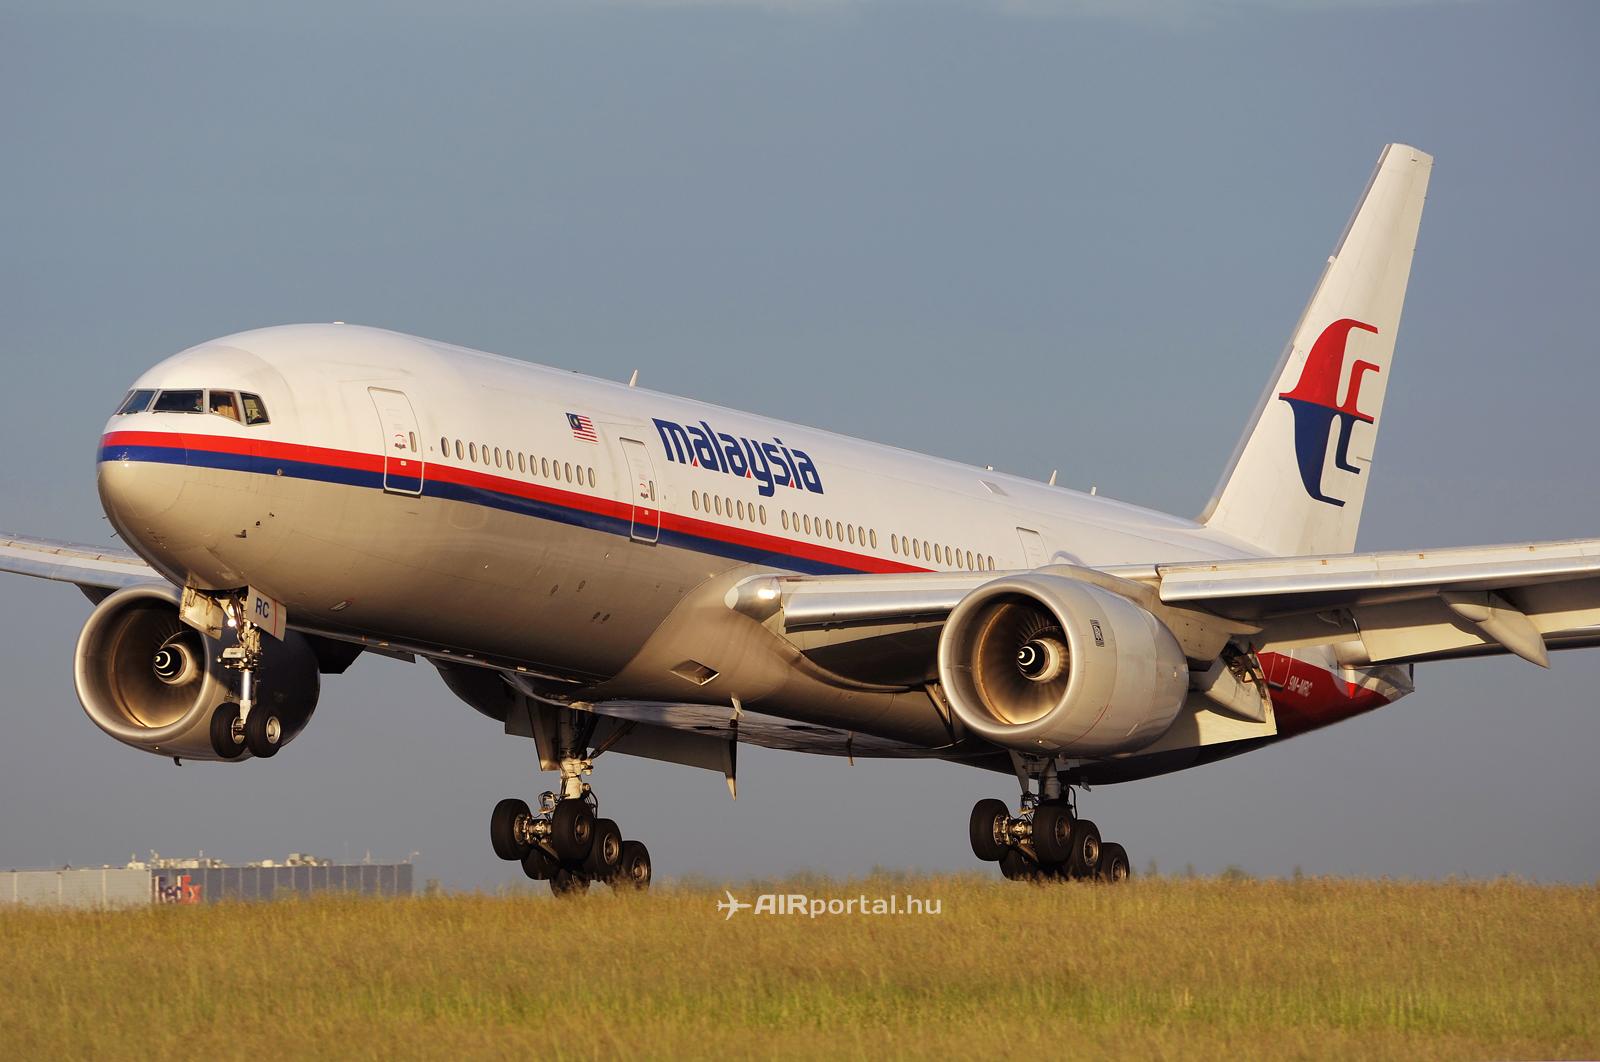 A Malaysian Airlines Boeing 777-200ER típusú repülőgépe a párizsi Charles de Gaulle repülőterén. (Fotó: Kovács Gábor - AIRportal.hu)   © AIRportal.hu